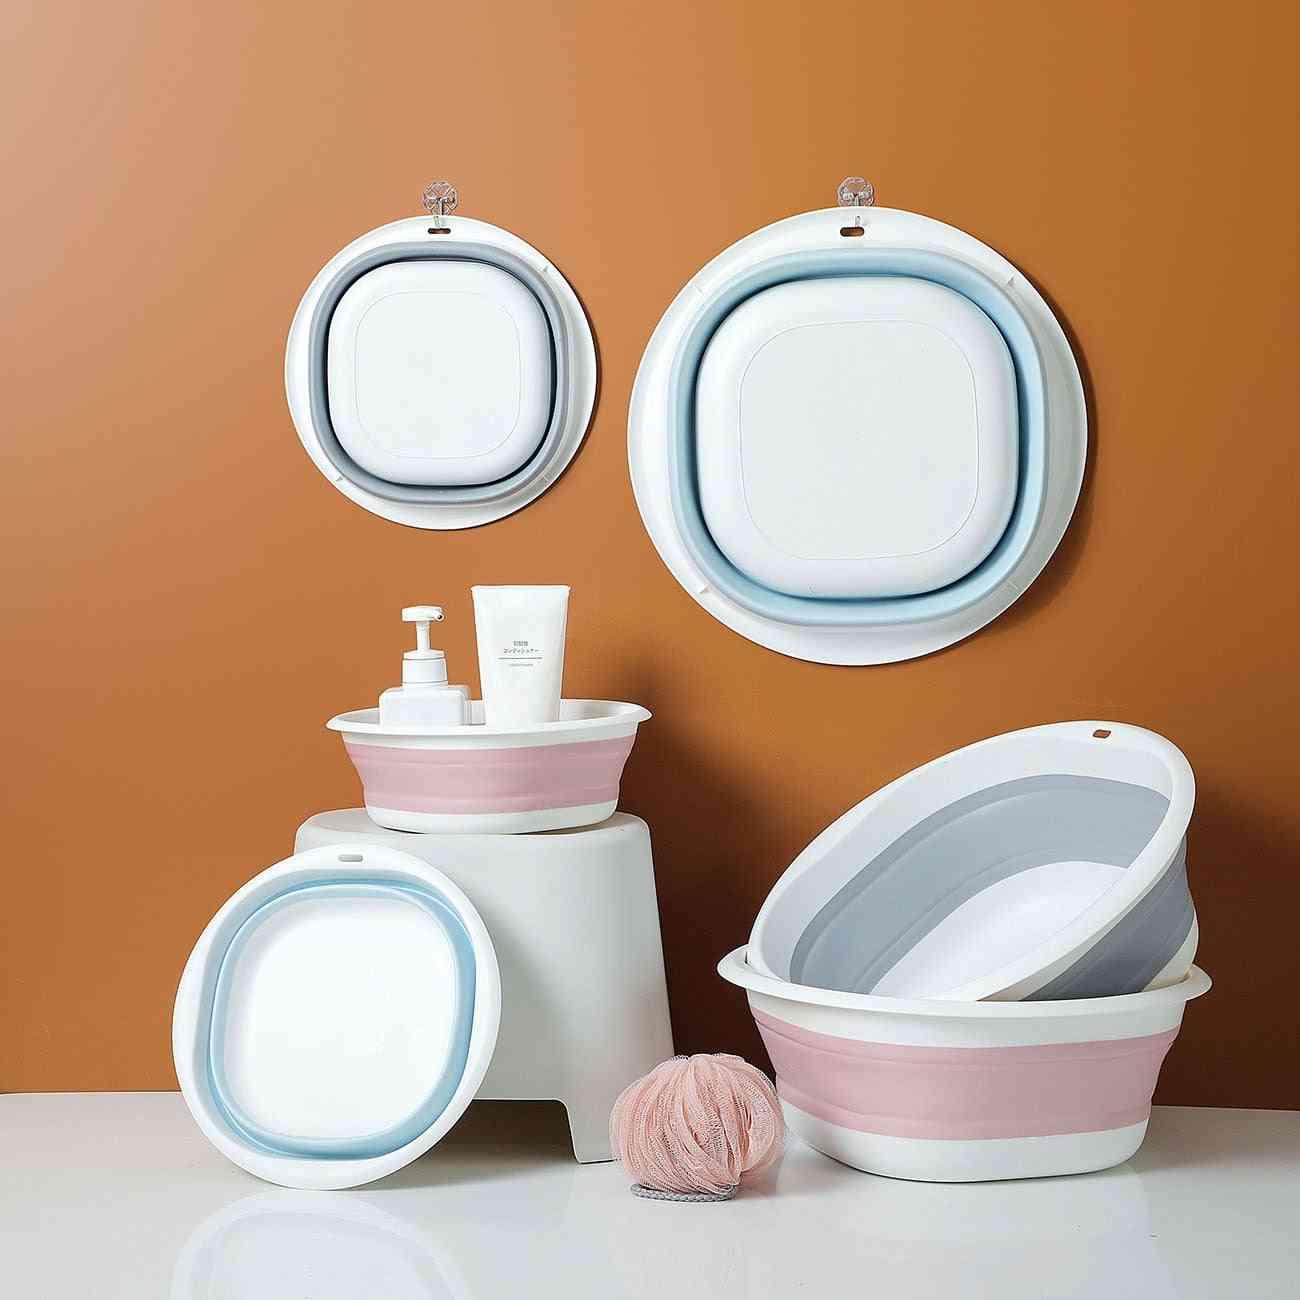 Portable- Folding Wash Basin, Sink Foot Bucket